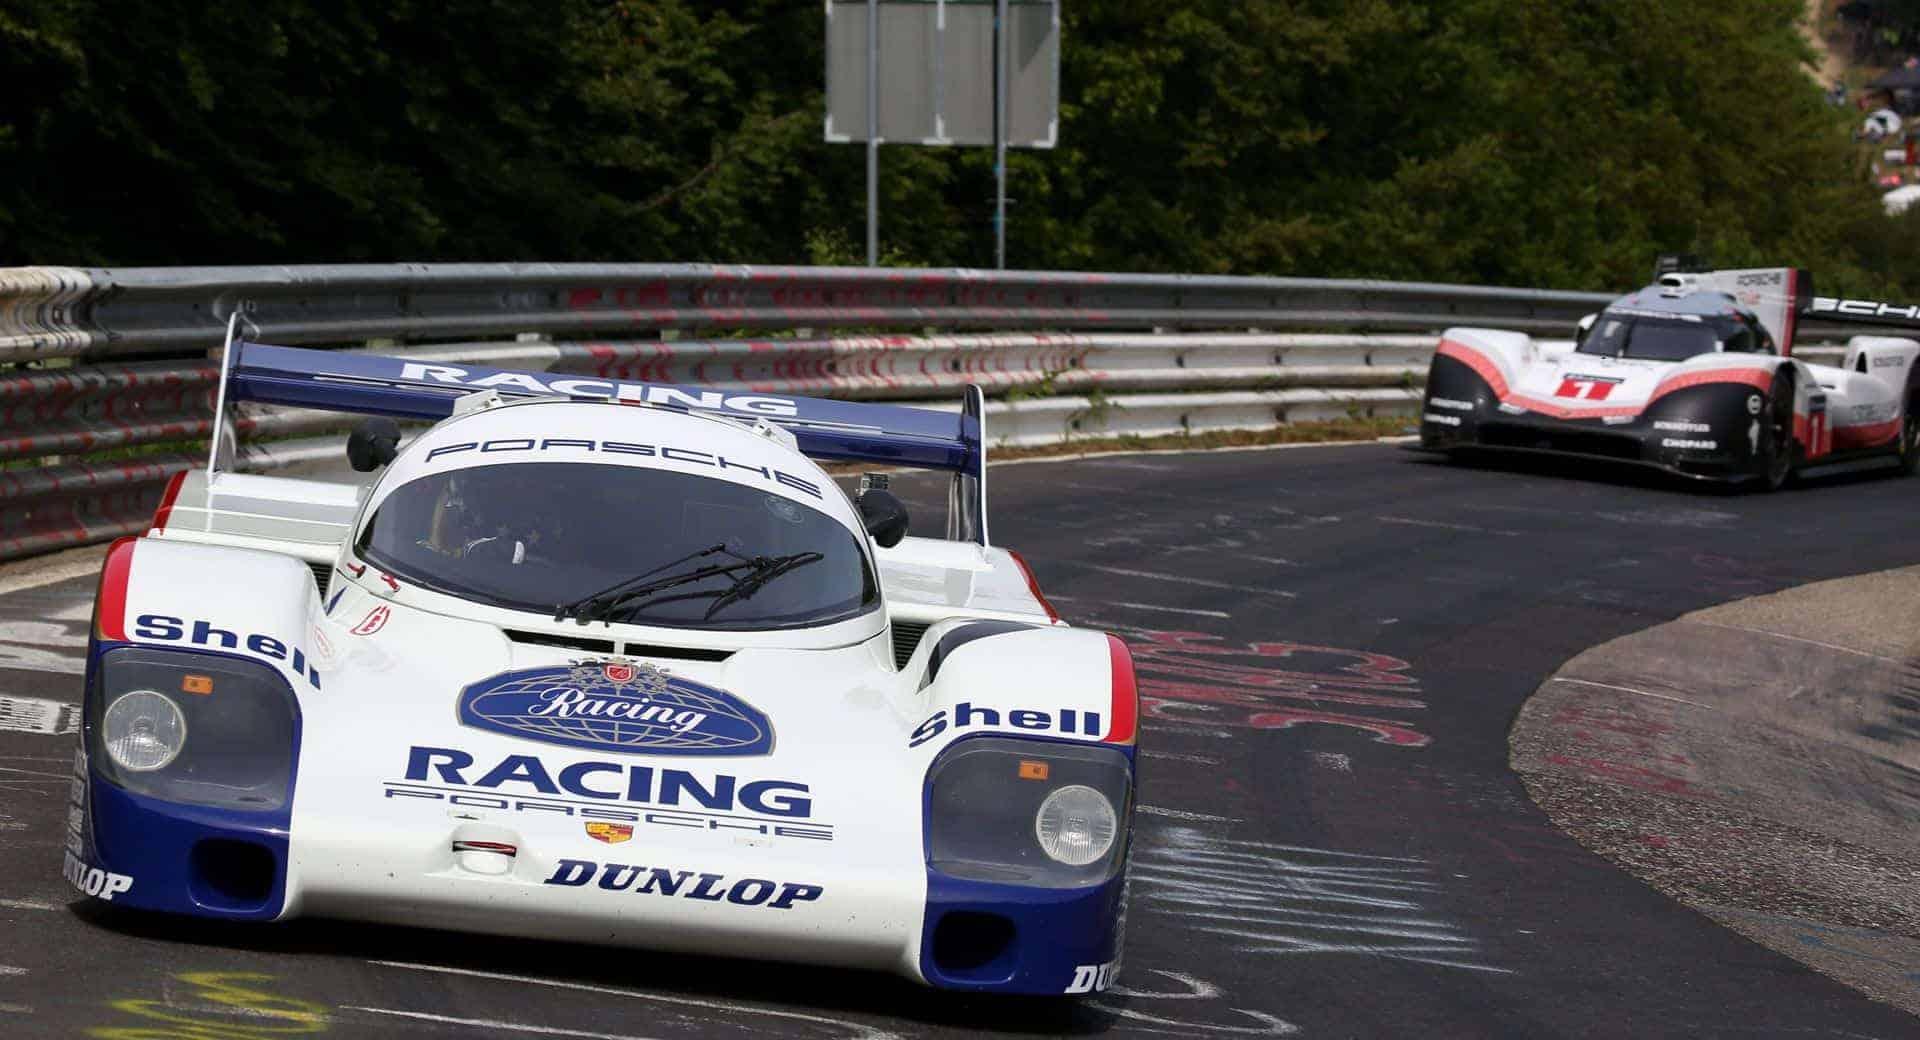 Porsche 956 and 919 Hybrid EVO Nurburgring caroussel